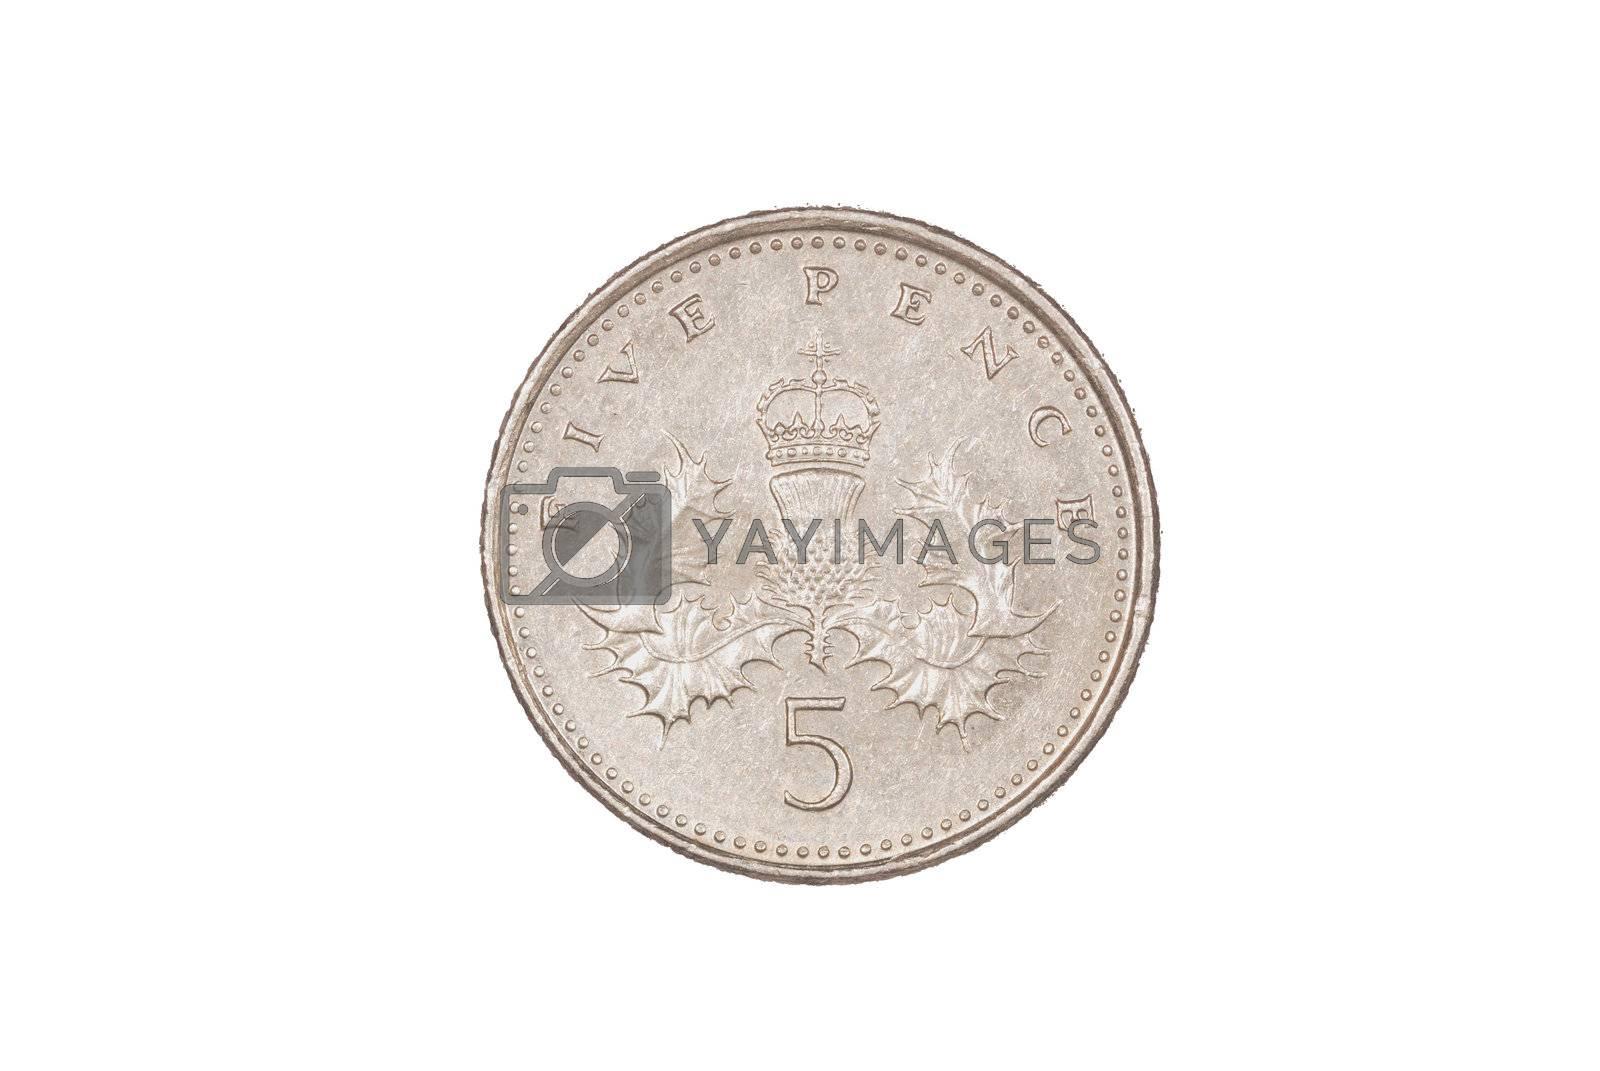 Close up of 5 pence piece